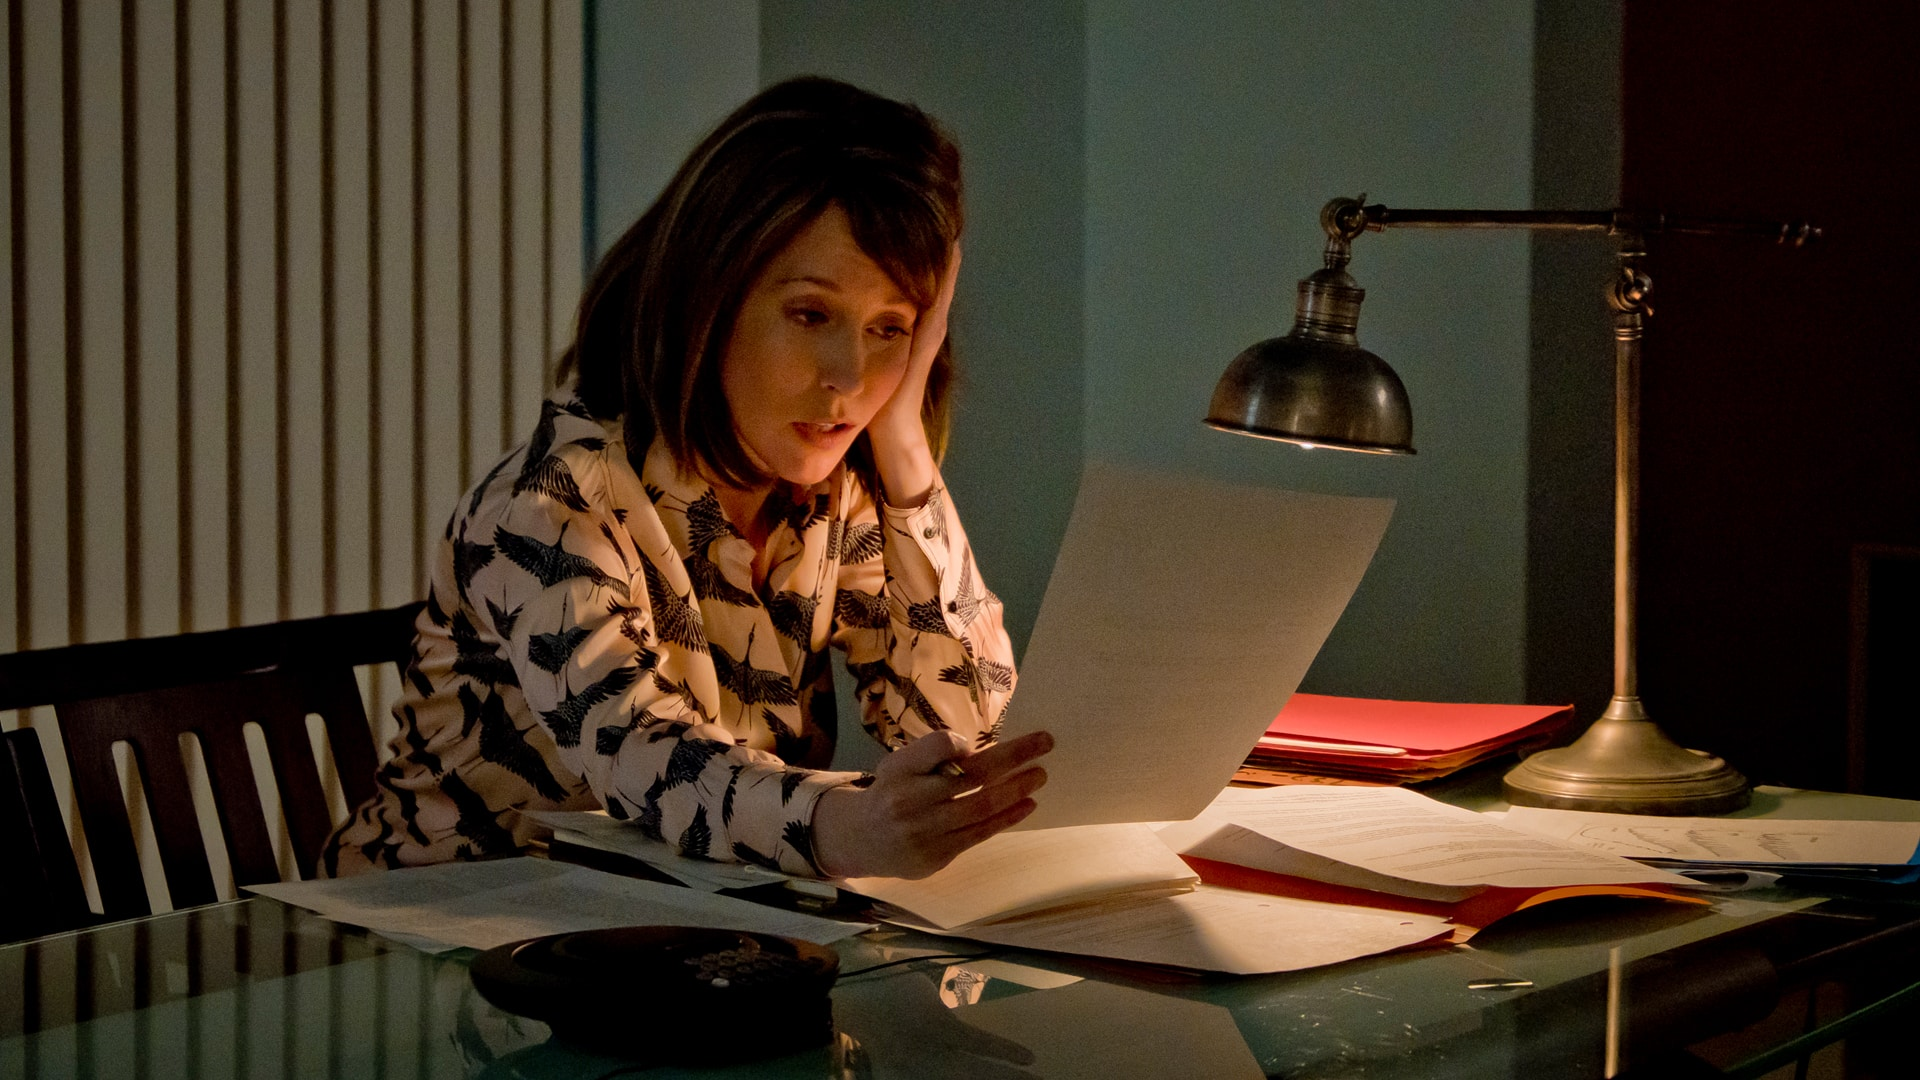 Work-Life Balance (Jan 25)